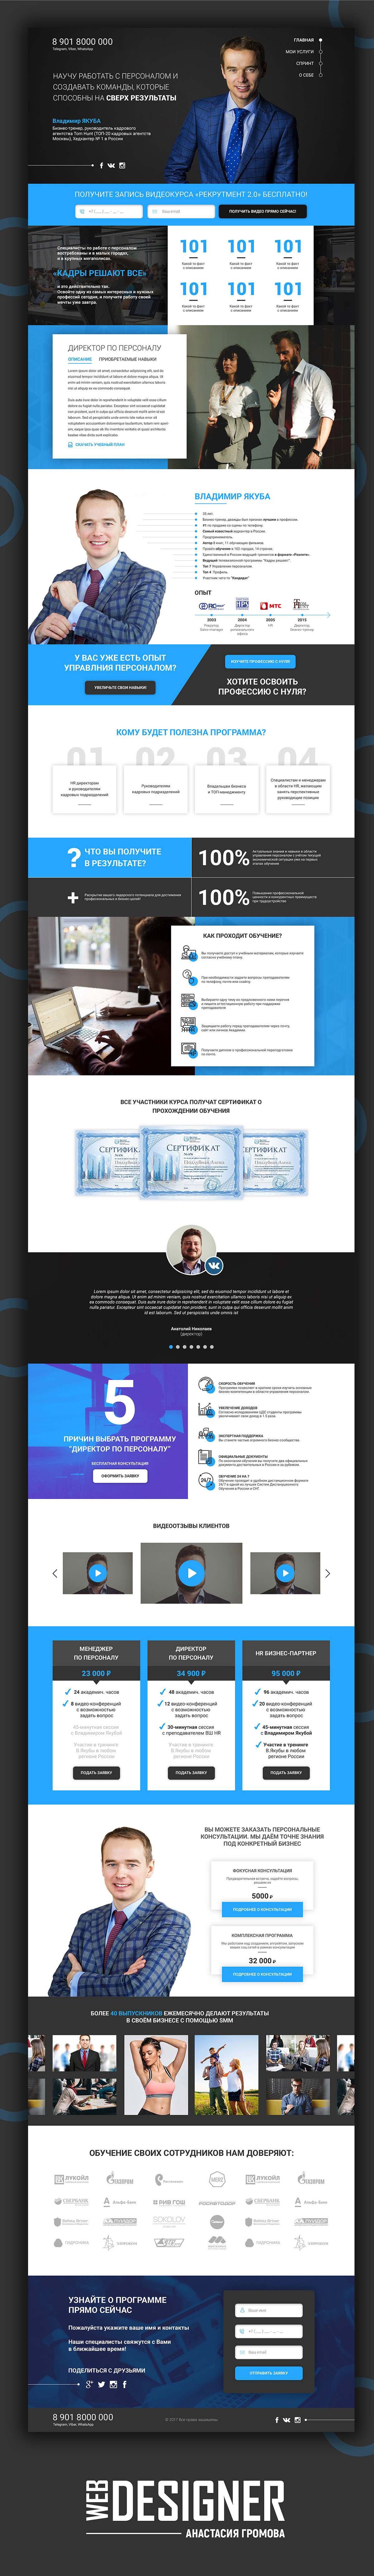 Landing page бизнес-тренер